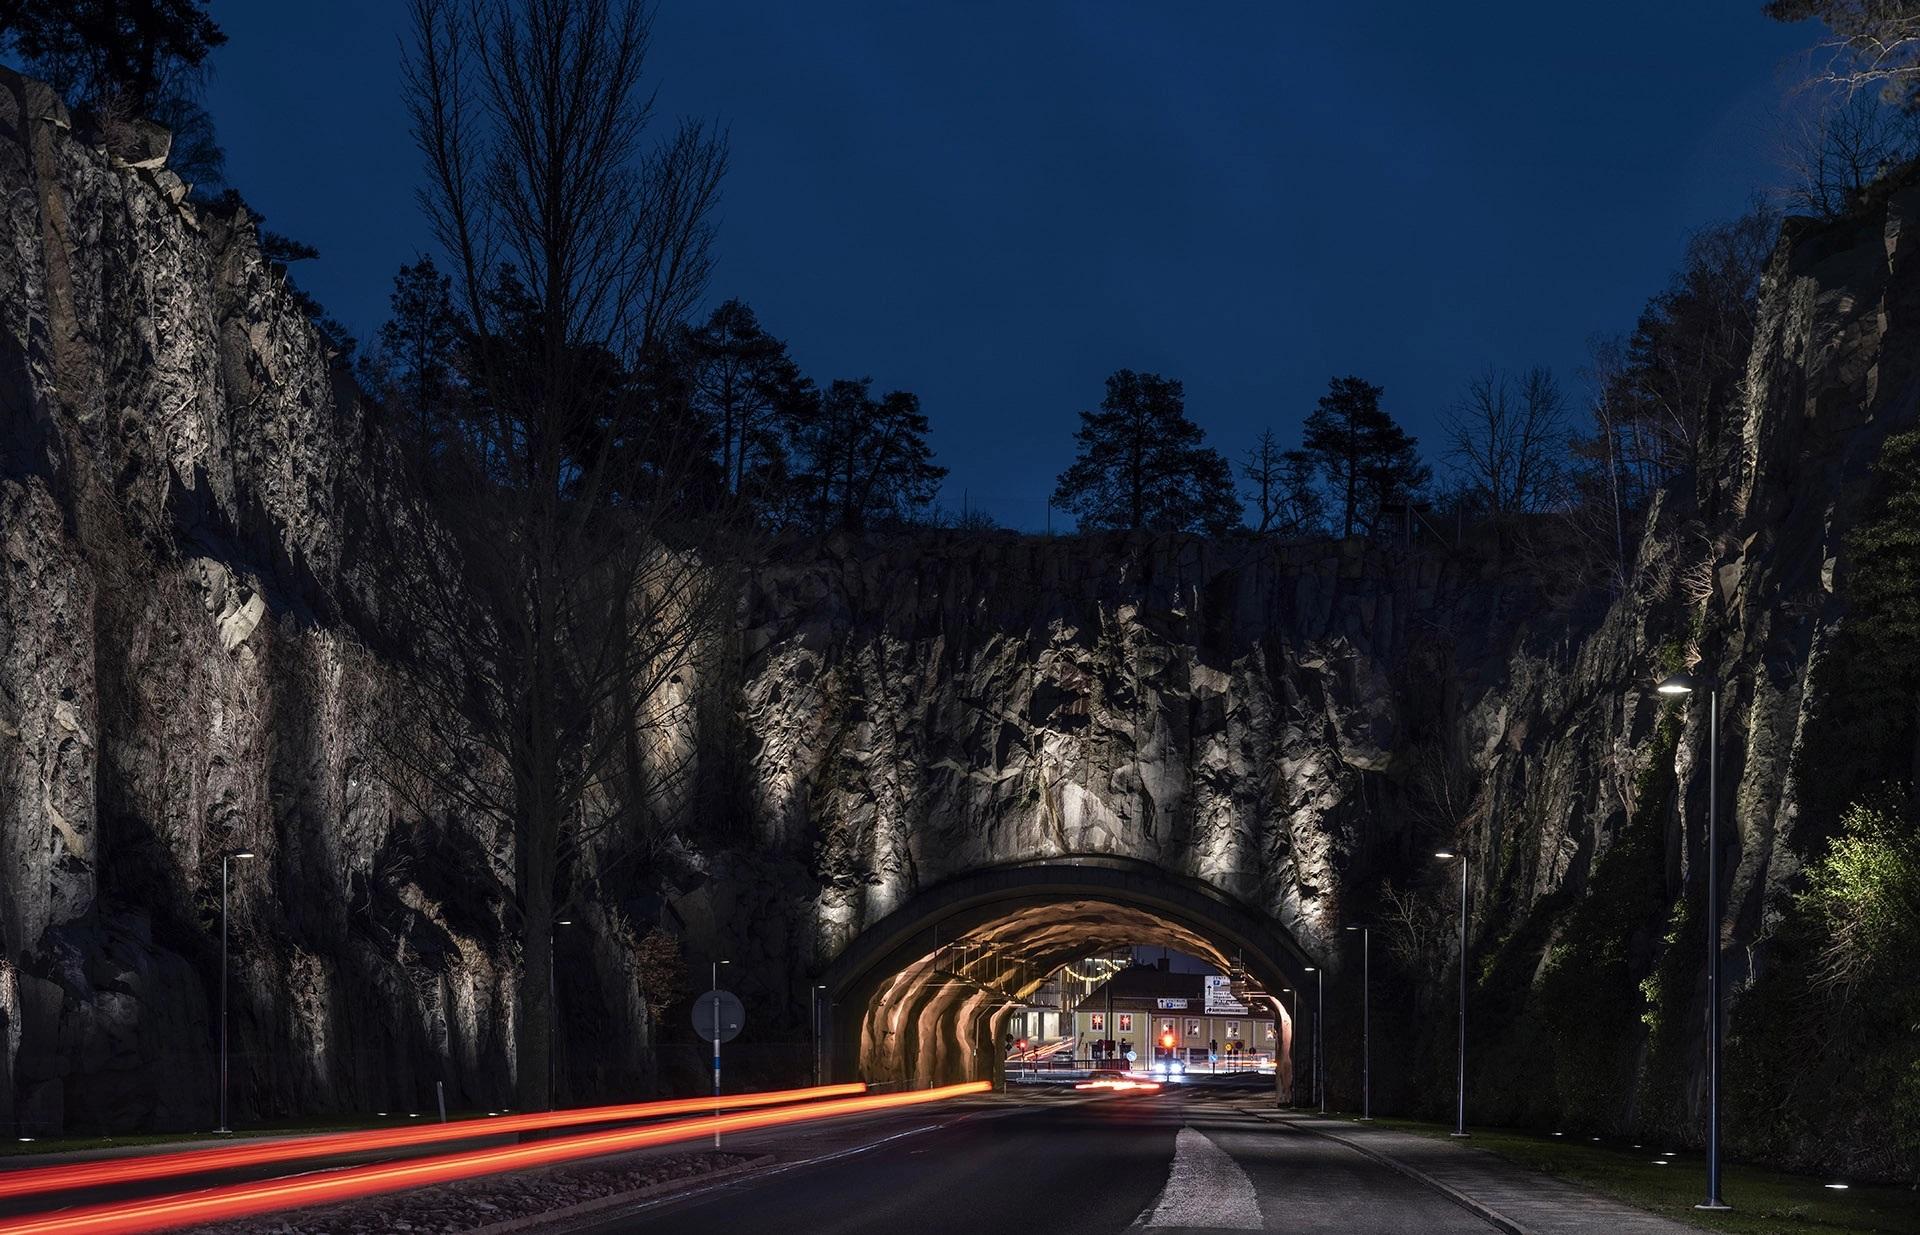 GVA Lighting Hinse Mountain - The City Gate to Karlshamn